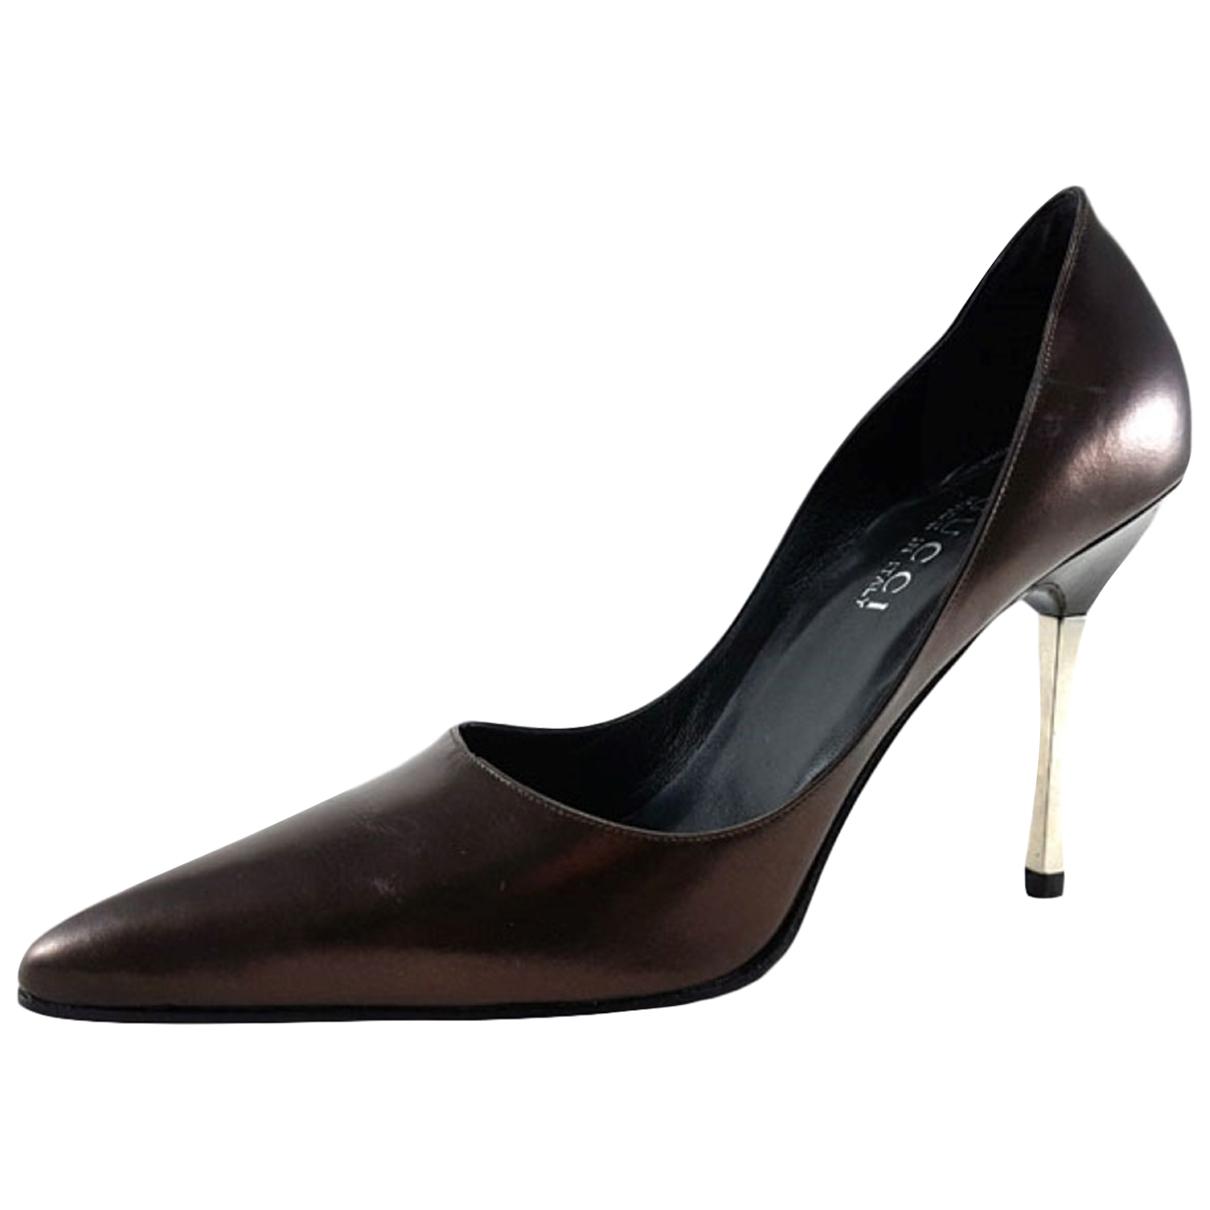 Gucci N Burgundy Leather Heels for Women 39.5 EU